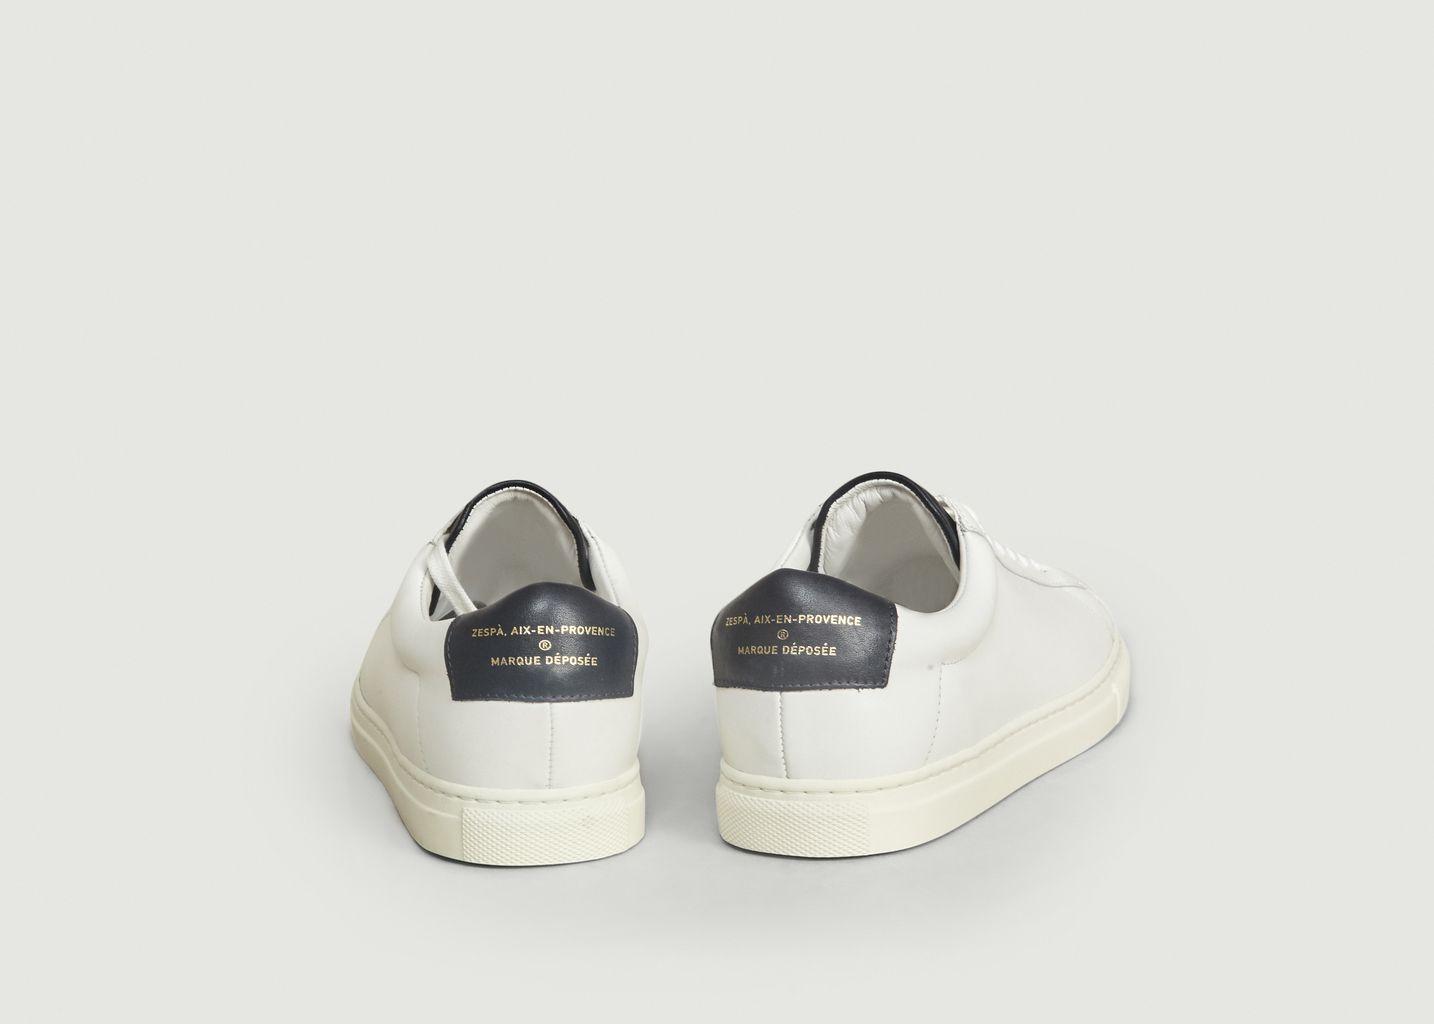 Sneakers ZSP4 En Cuir Nappa Apla - Zespa